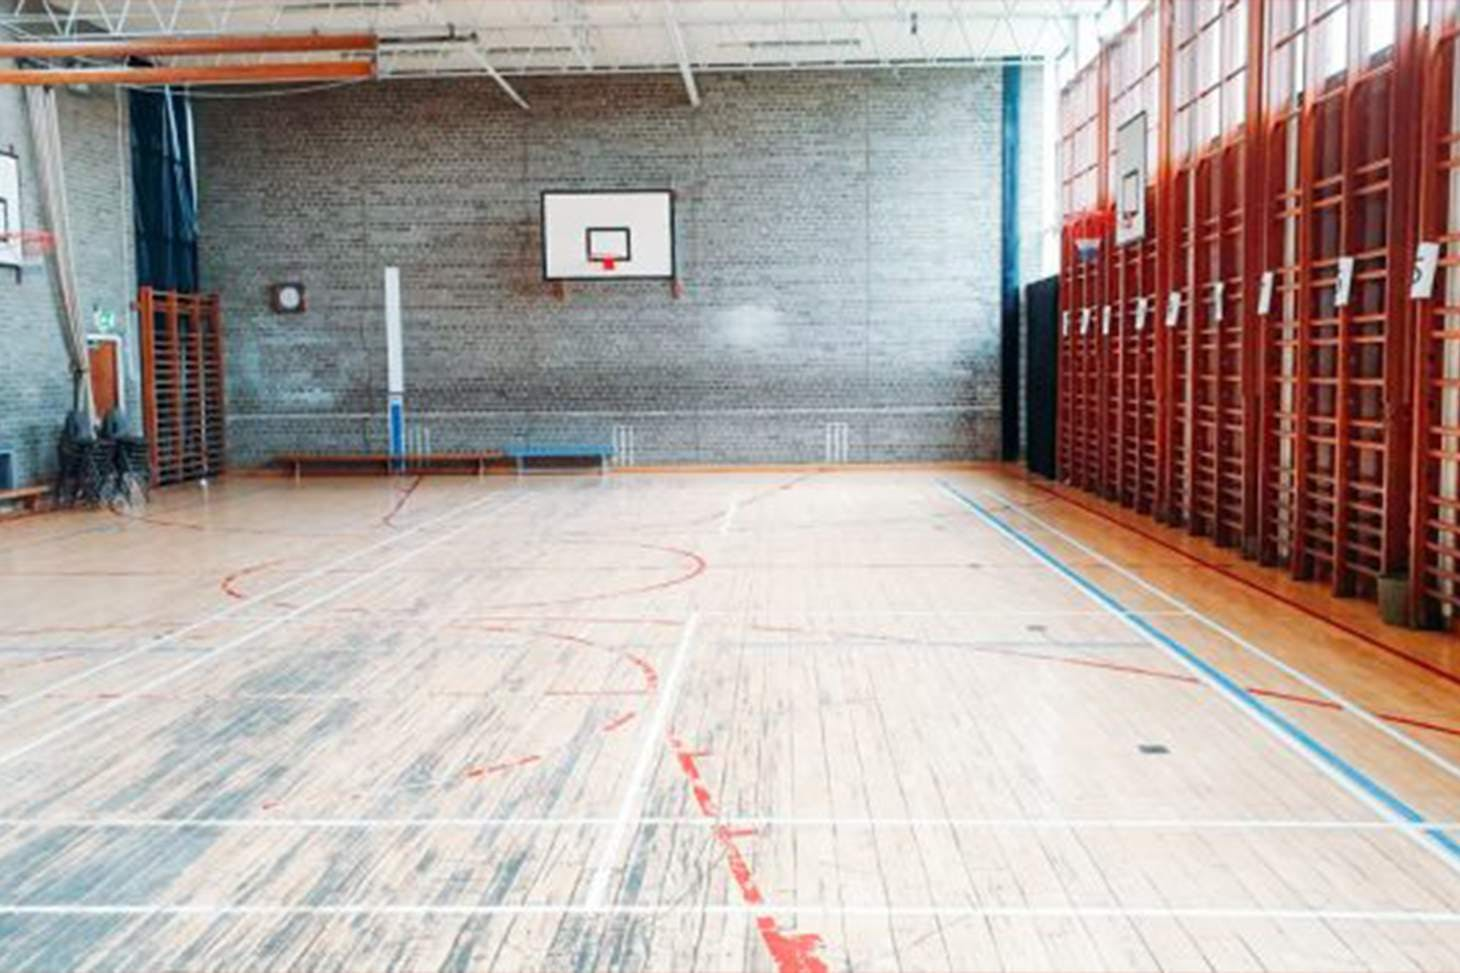 Laureate Academy Court | Gymnasium basketball court